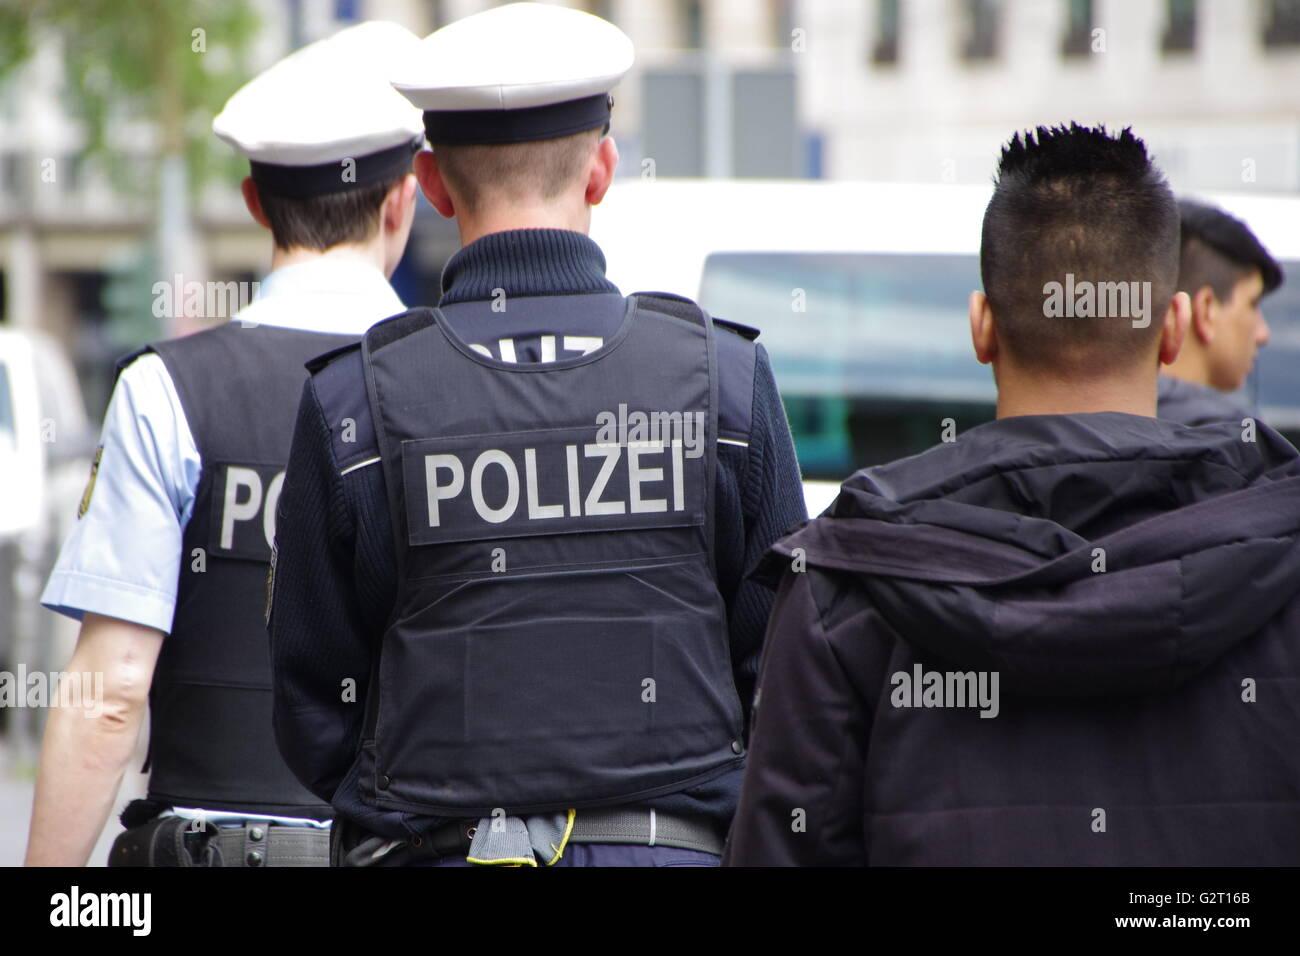 Police men in Frankfurt am Main railway station. Stock Photo